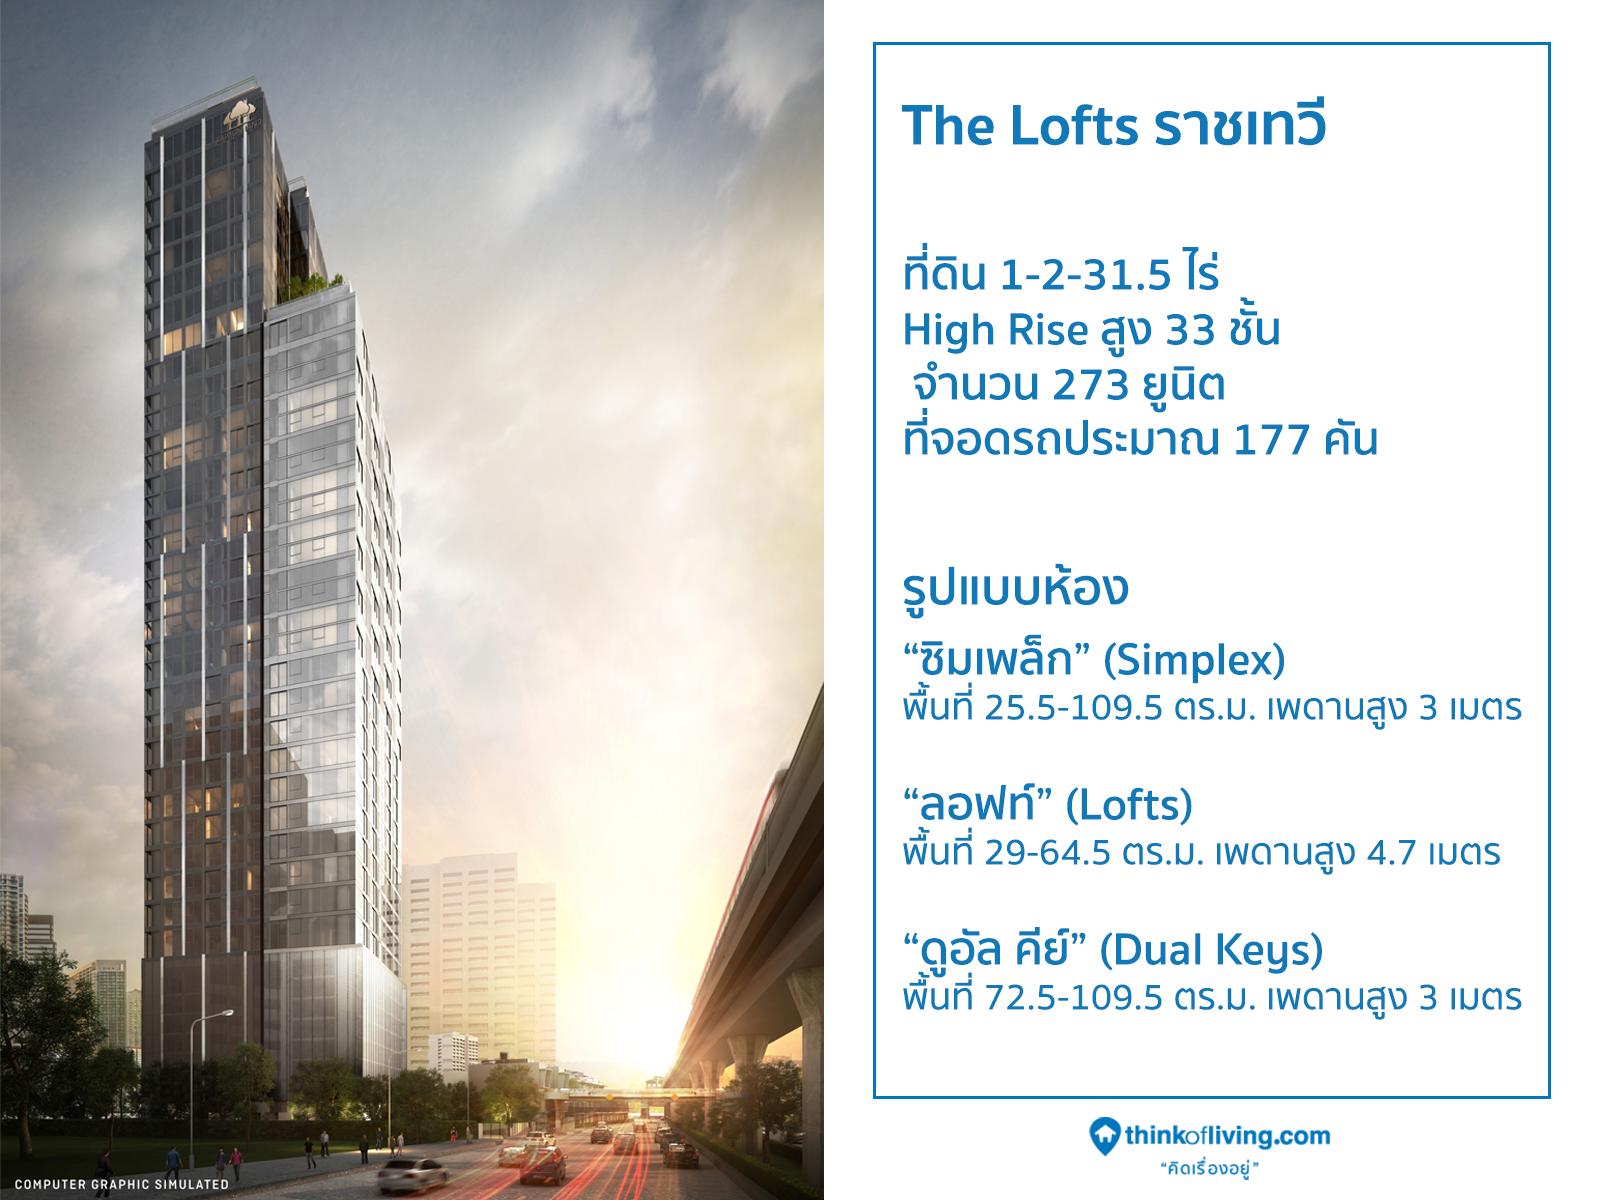 The Lofts ราชเทวี